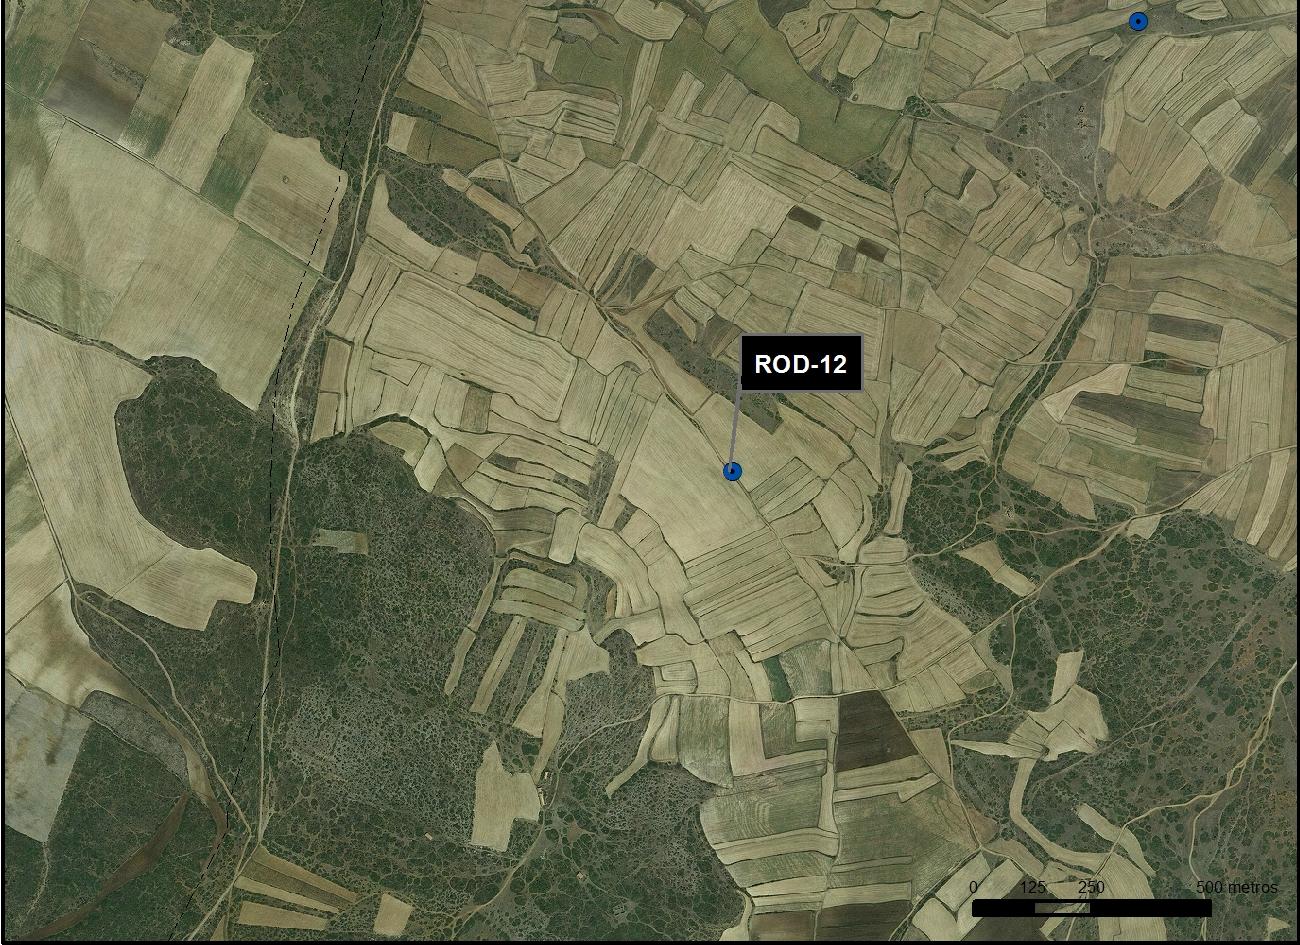 ROD_12_M.V.LOZANO_ POZO ESPUELA_ORTO 2